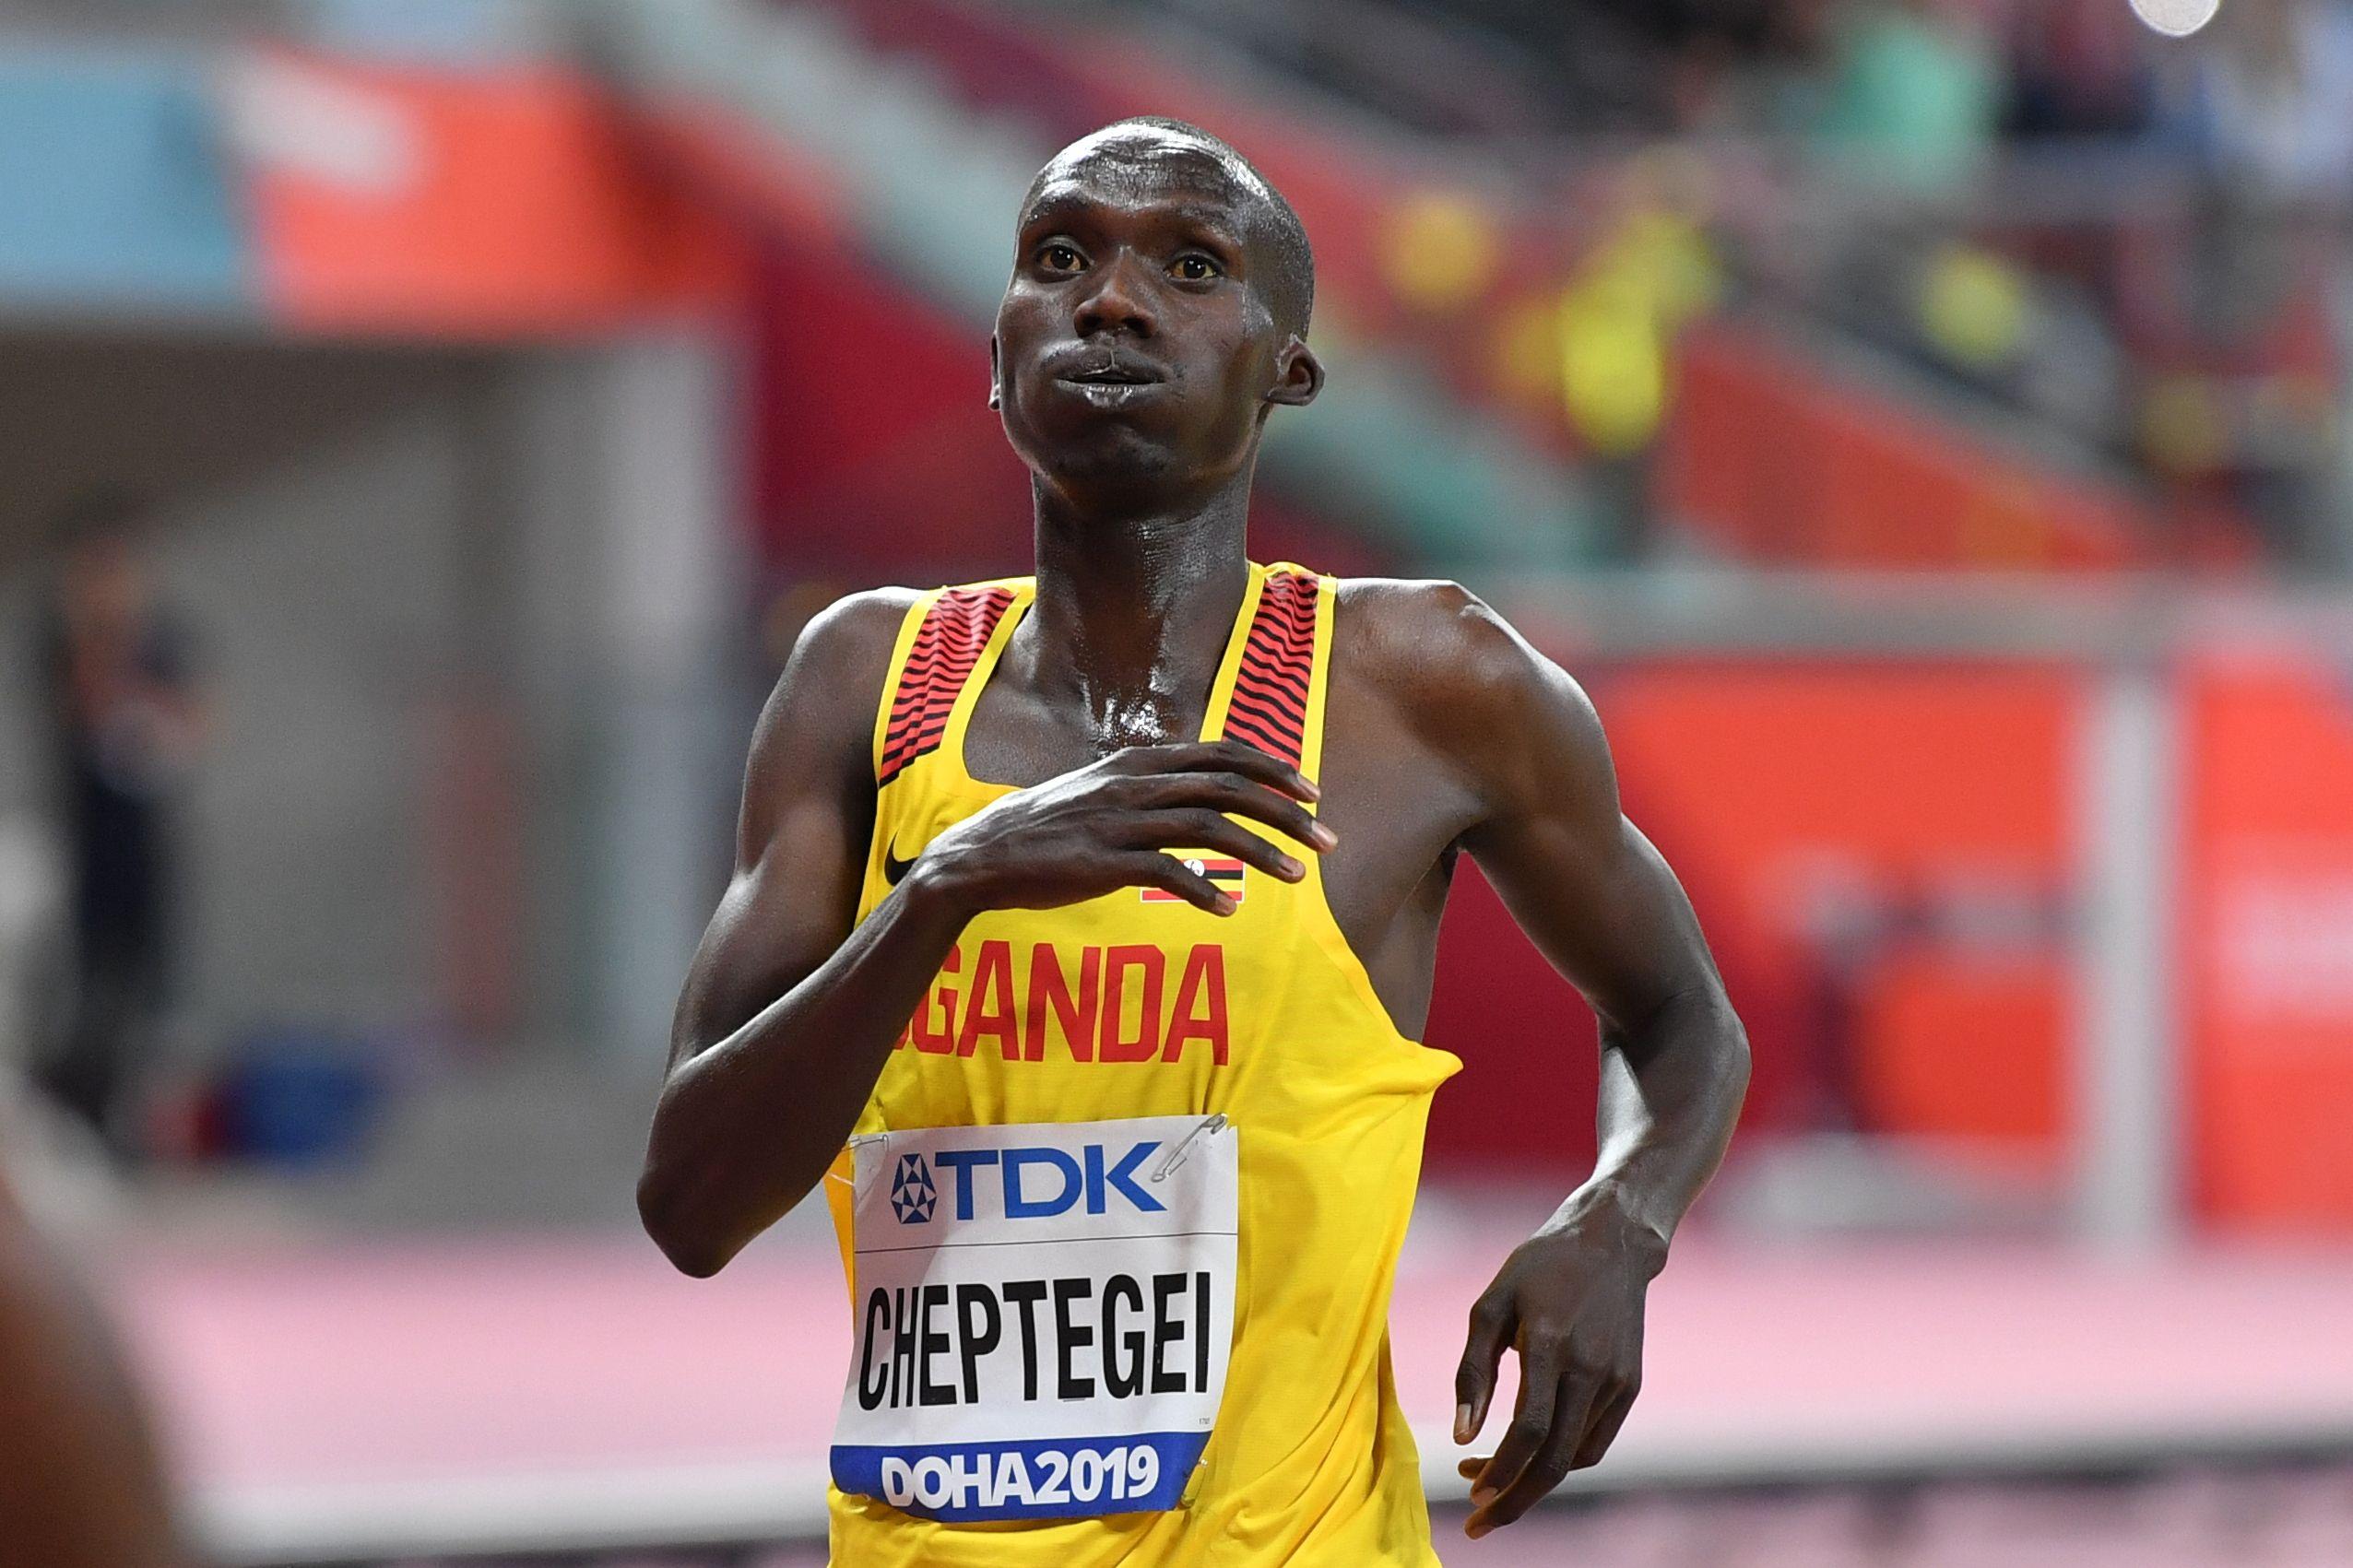 Uganda's Cheptegei shatters 5km world record in Monaco - Sports Leo